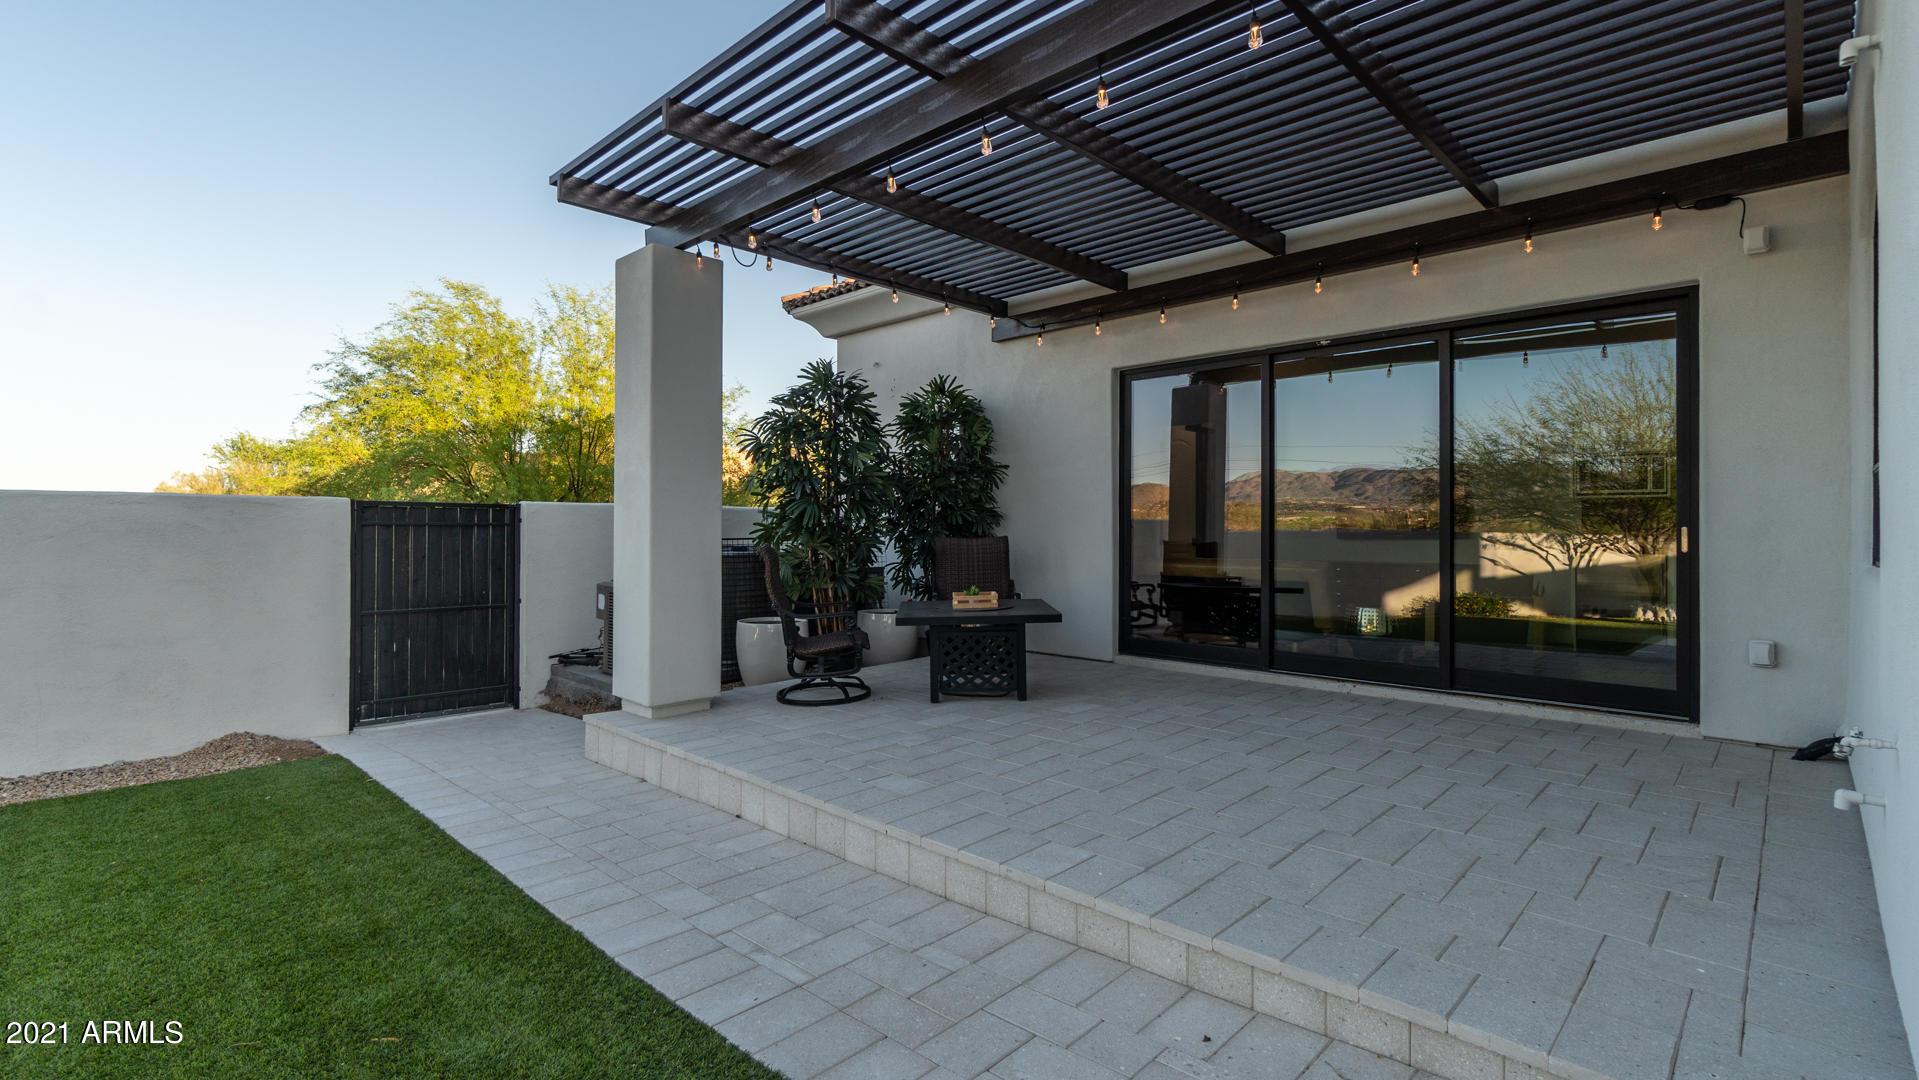 7658 NONCHALANT Avenue, Carefree, Arizona 85377, 5 Bedrooms Bedrooms, ,5.5 BathroomsBathrooms,Residential,For Sale,NONCHALANT,6214459